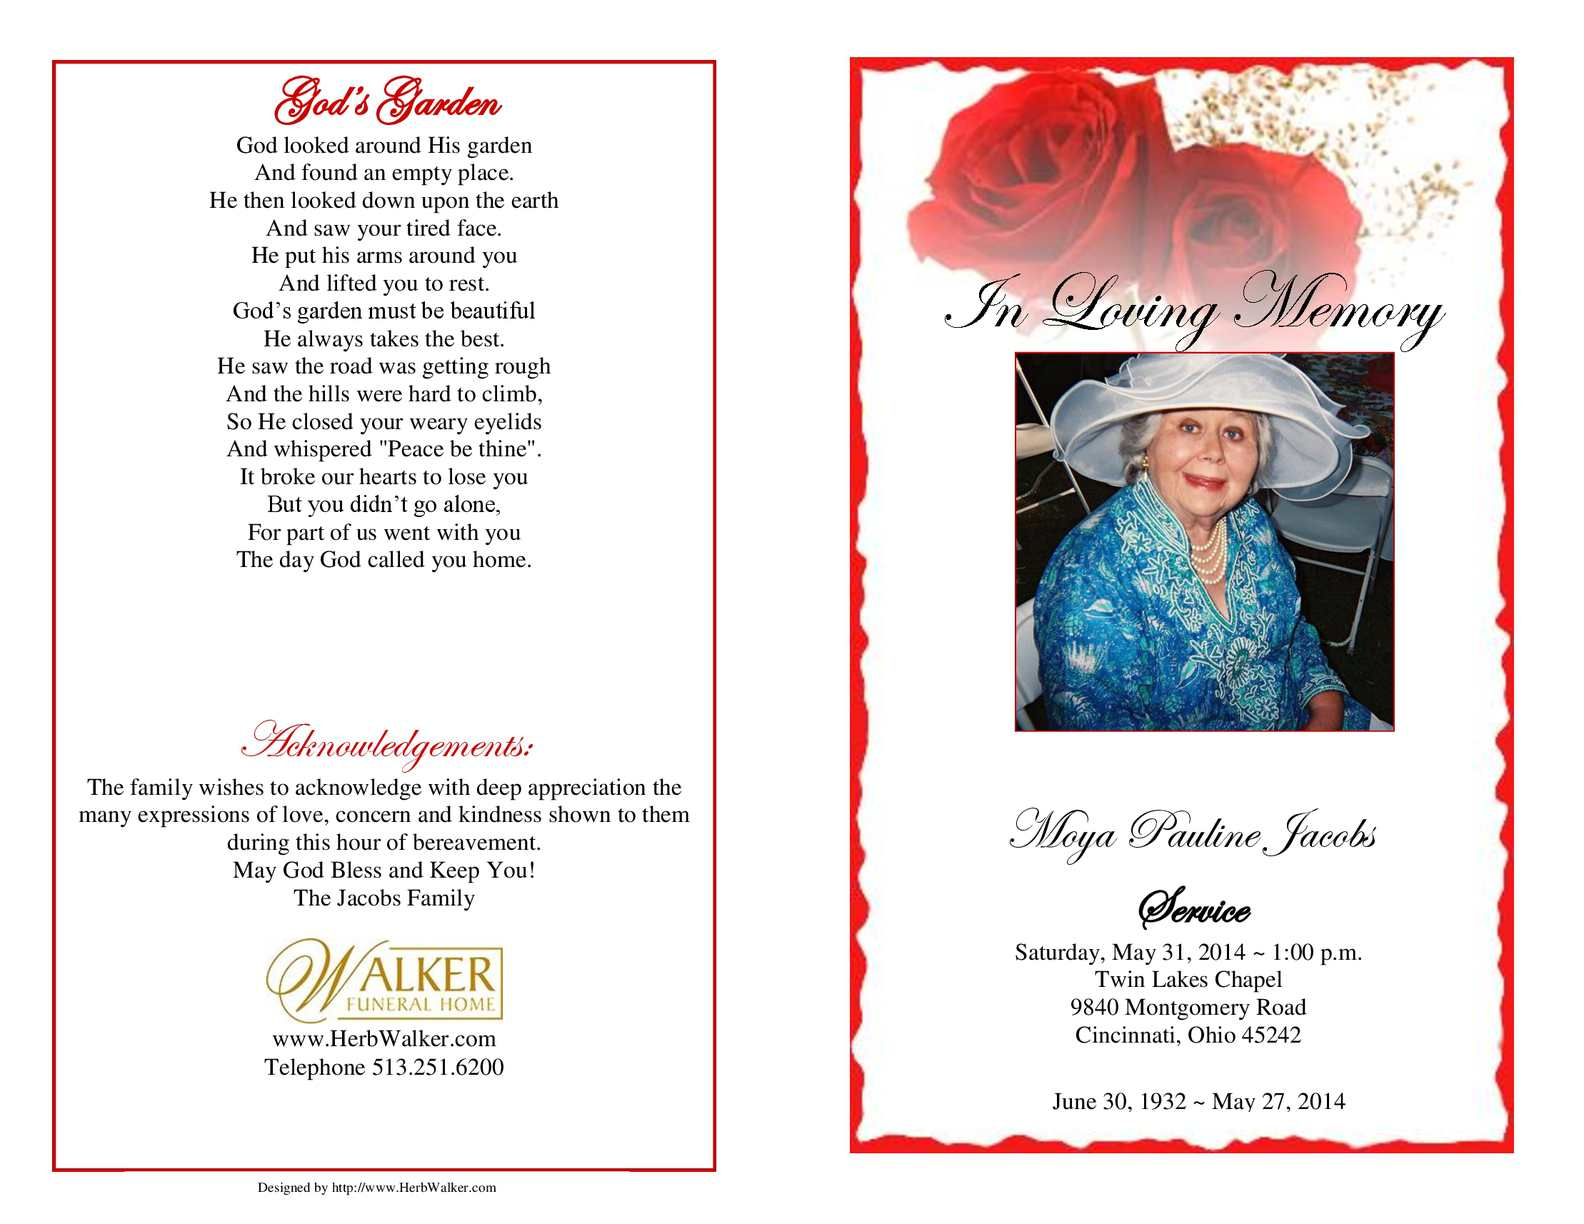 Calaméo Moya Pauline Jacobs Funeral Program